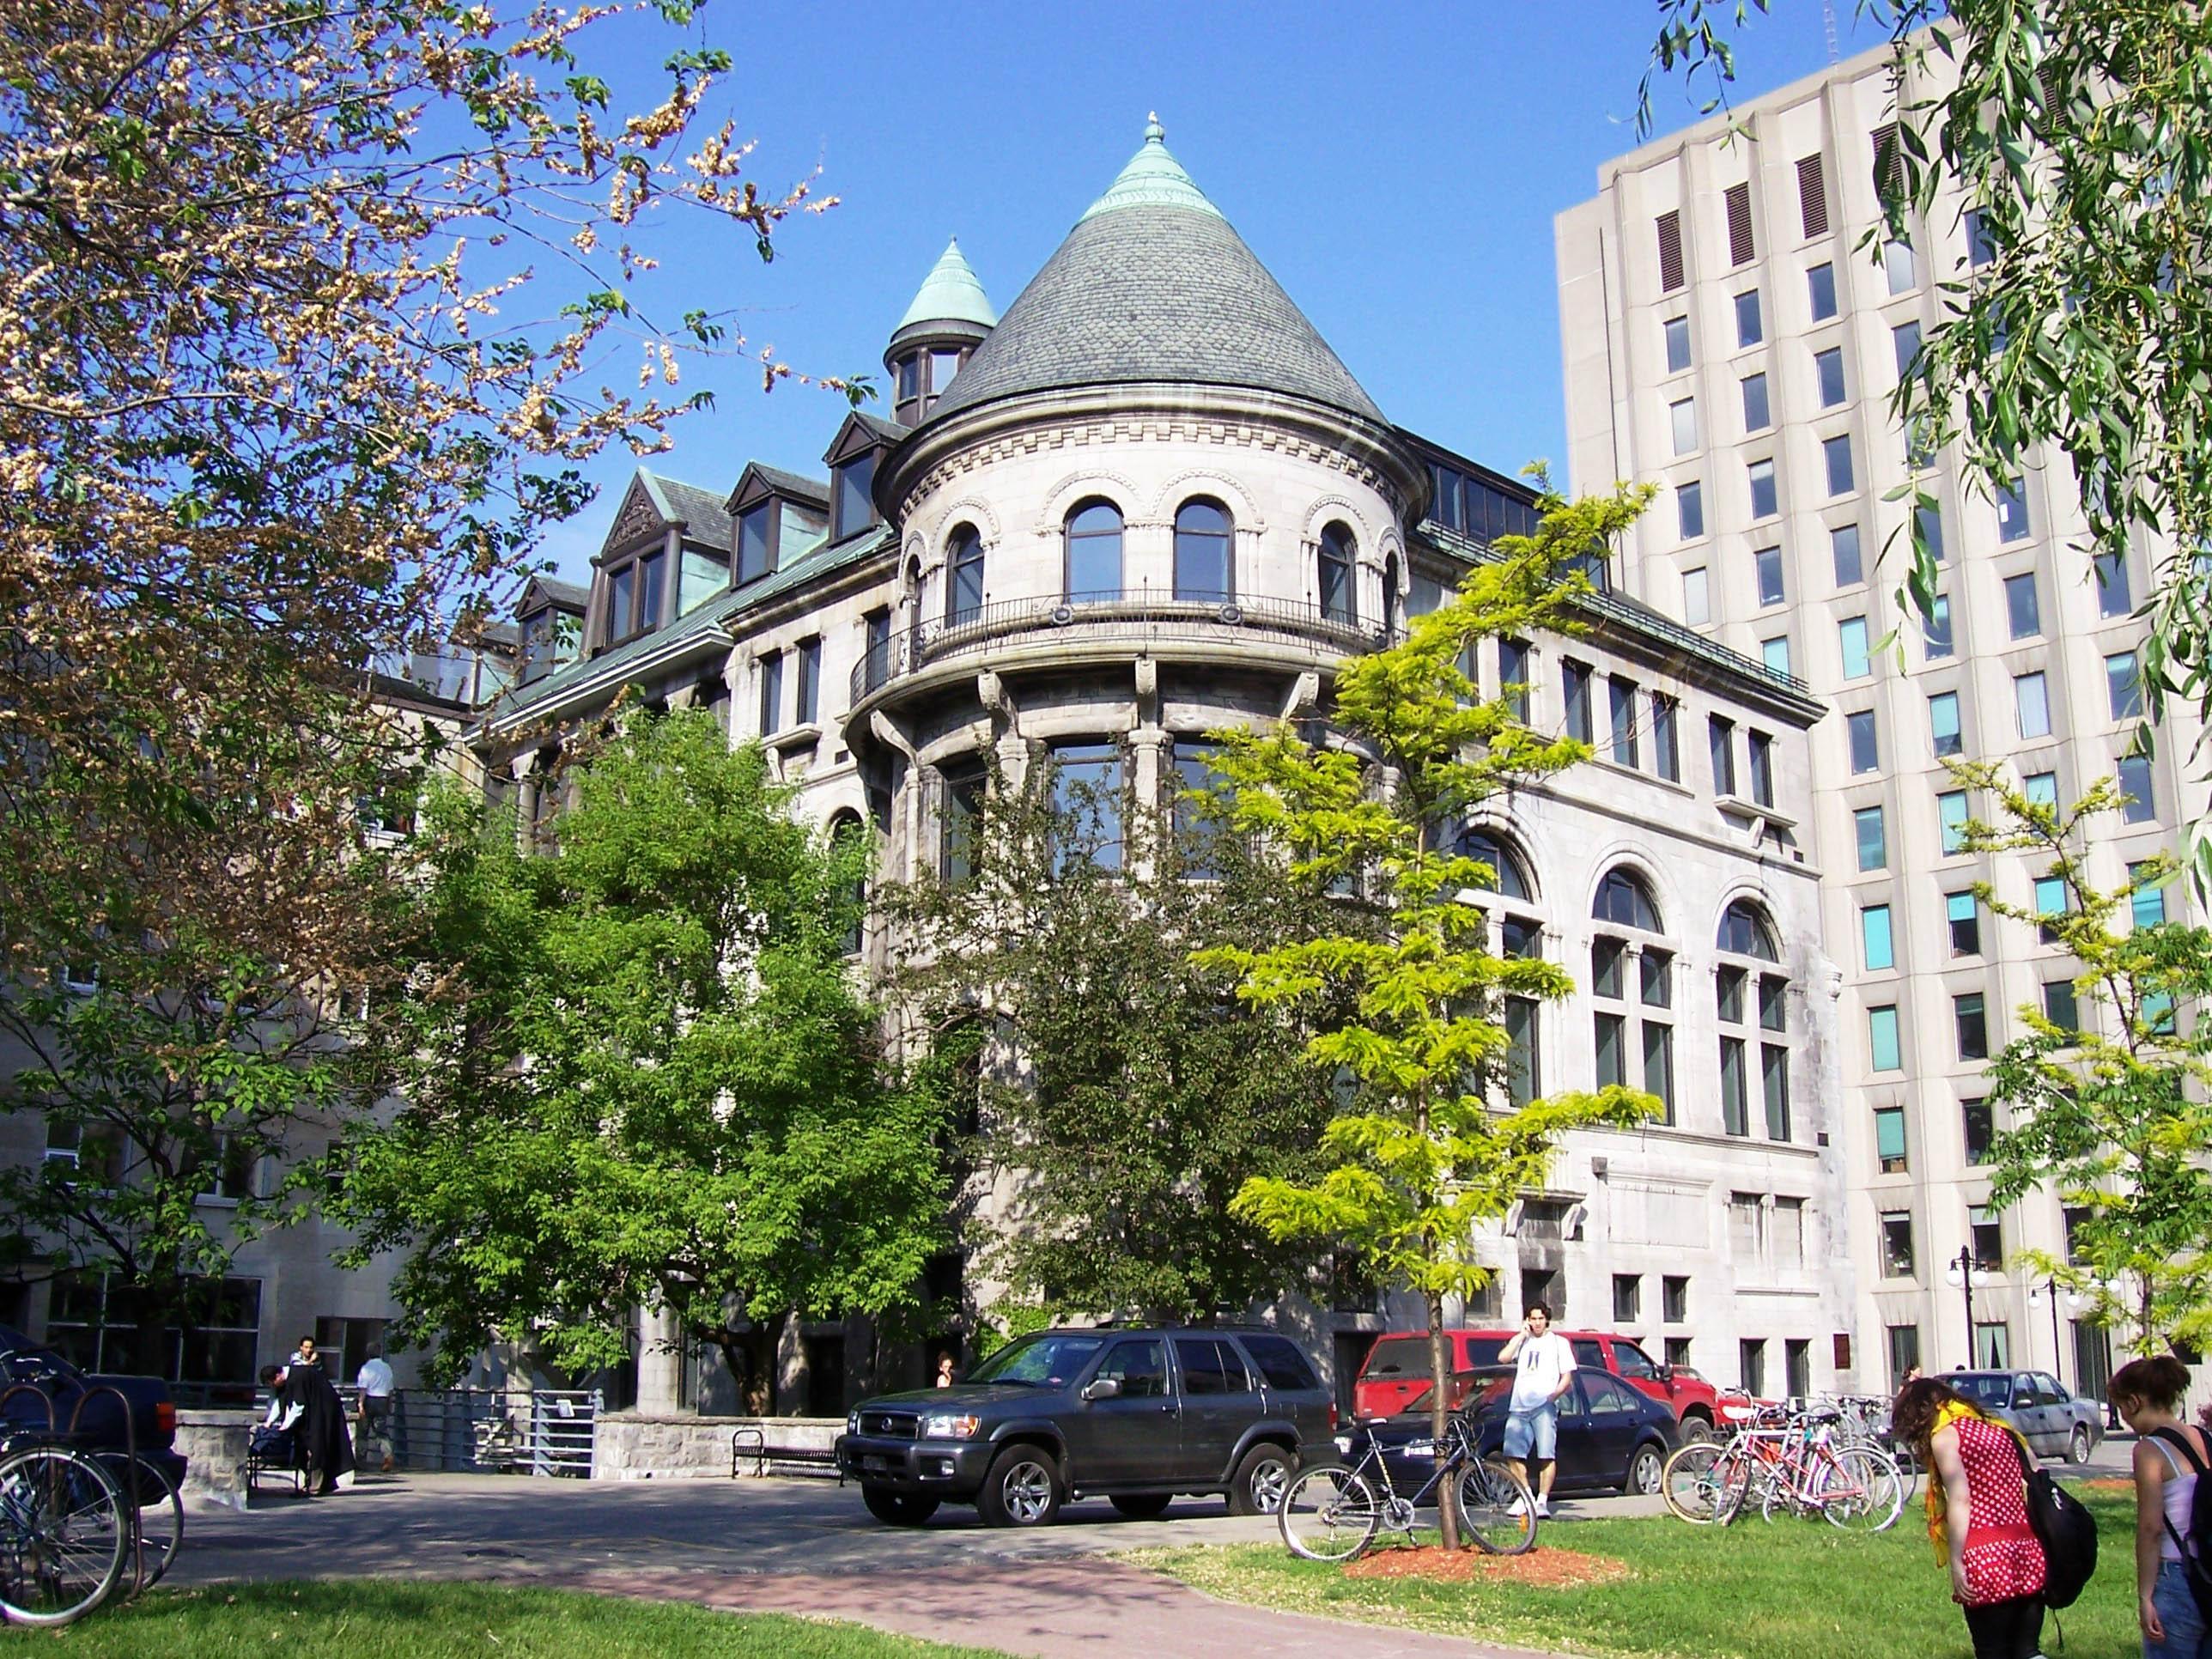 Macdonald-Stewart-Library